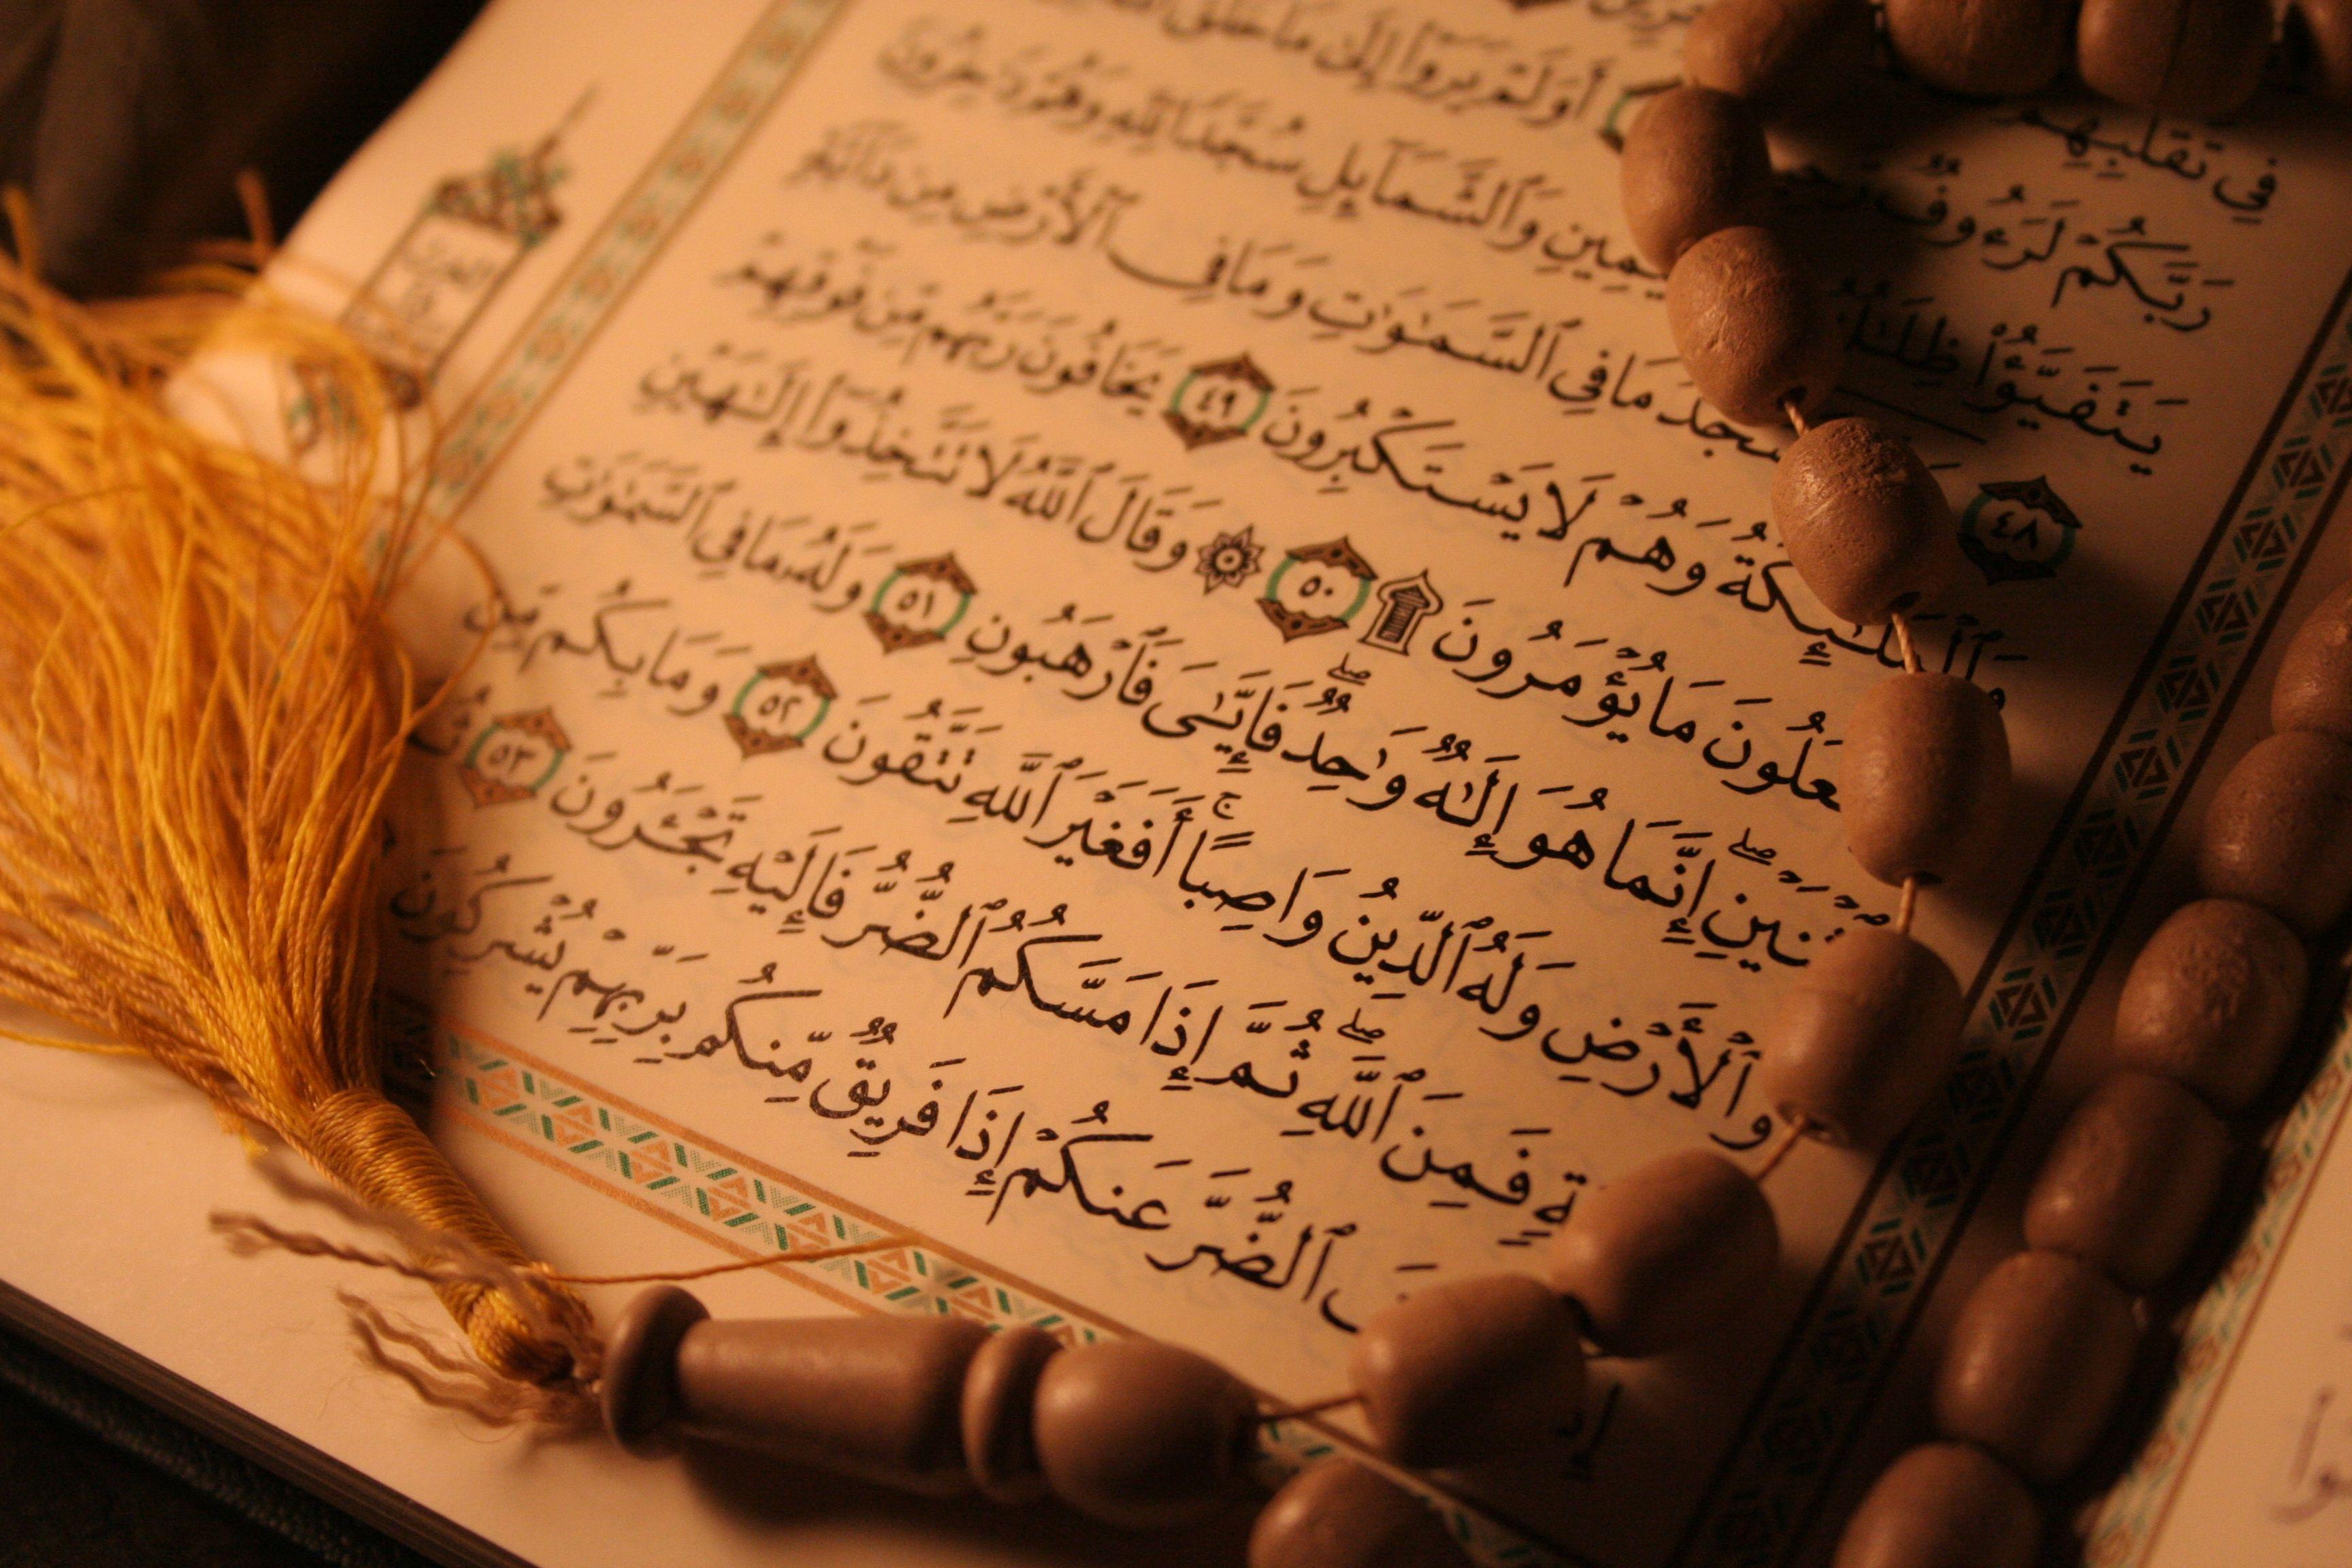 تفسیر آیات 142-144سوره انعام